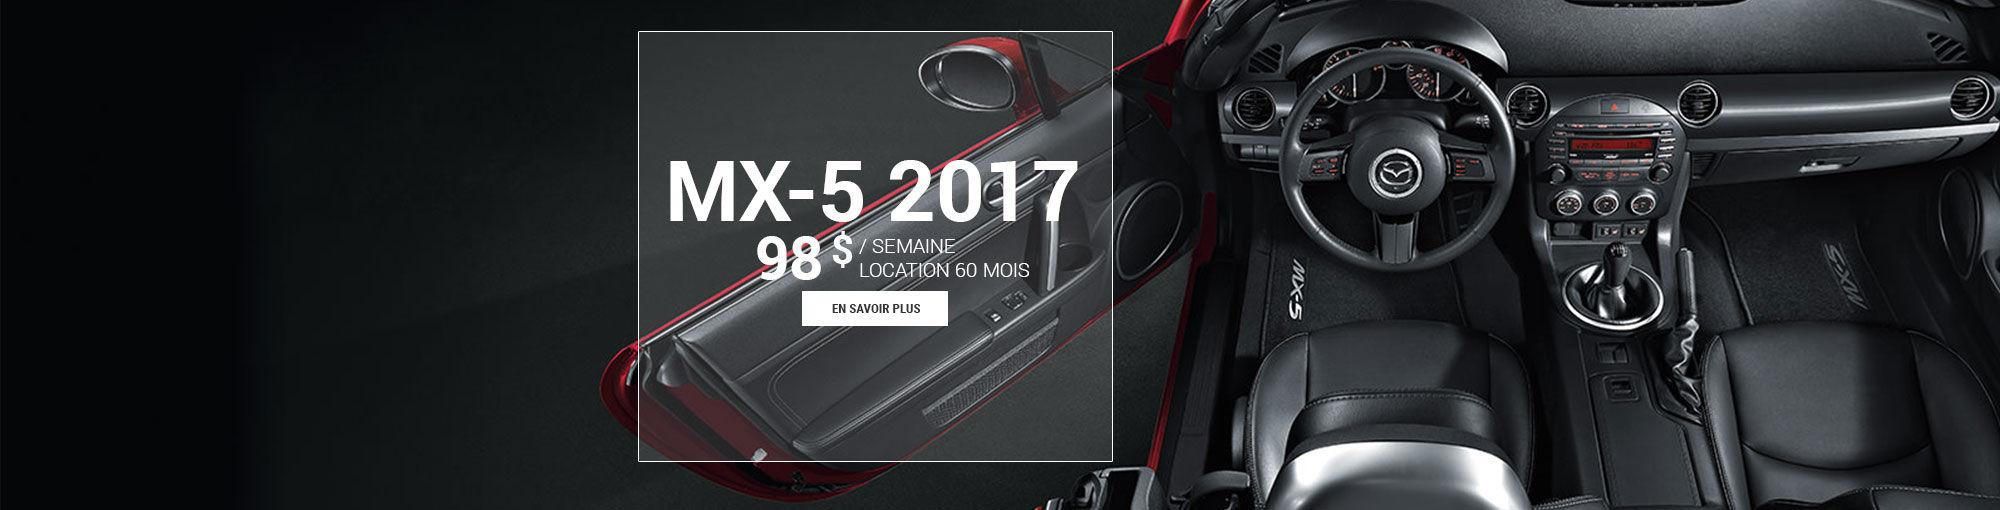 Mazda mx-5 2017 - mai 2017